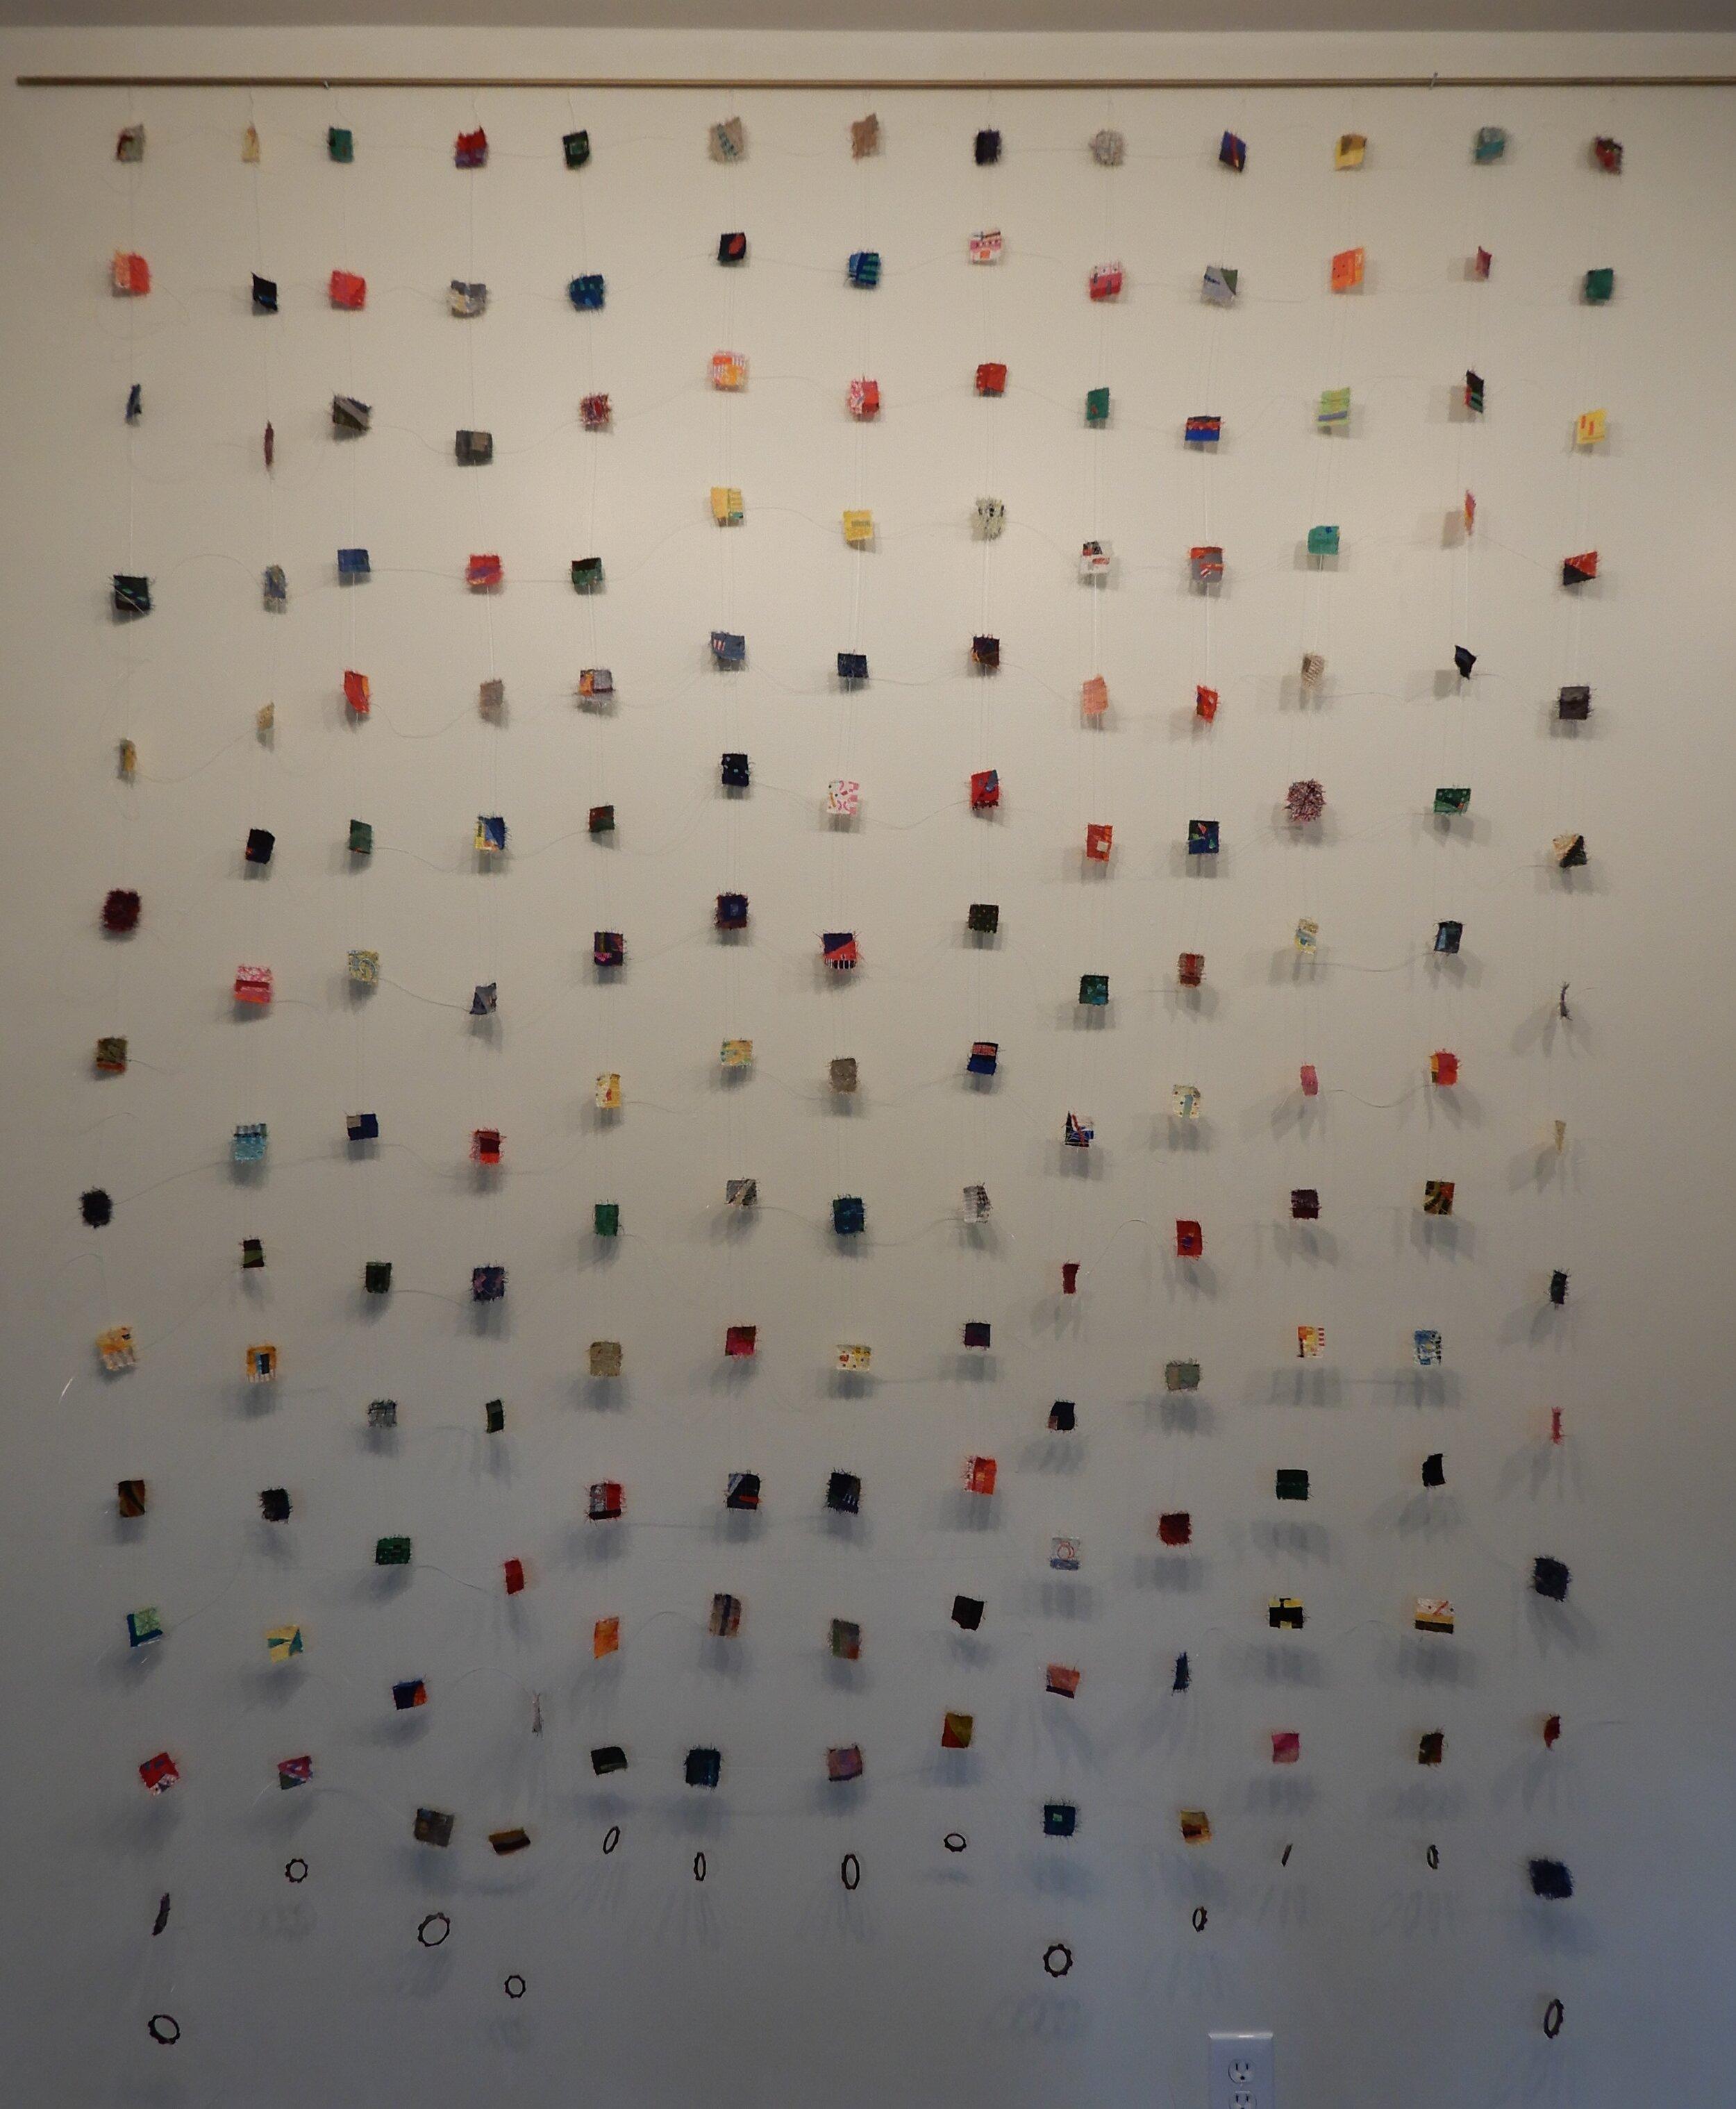 Kathleen Loomis : Social Distance